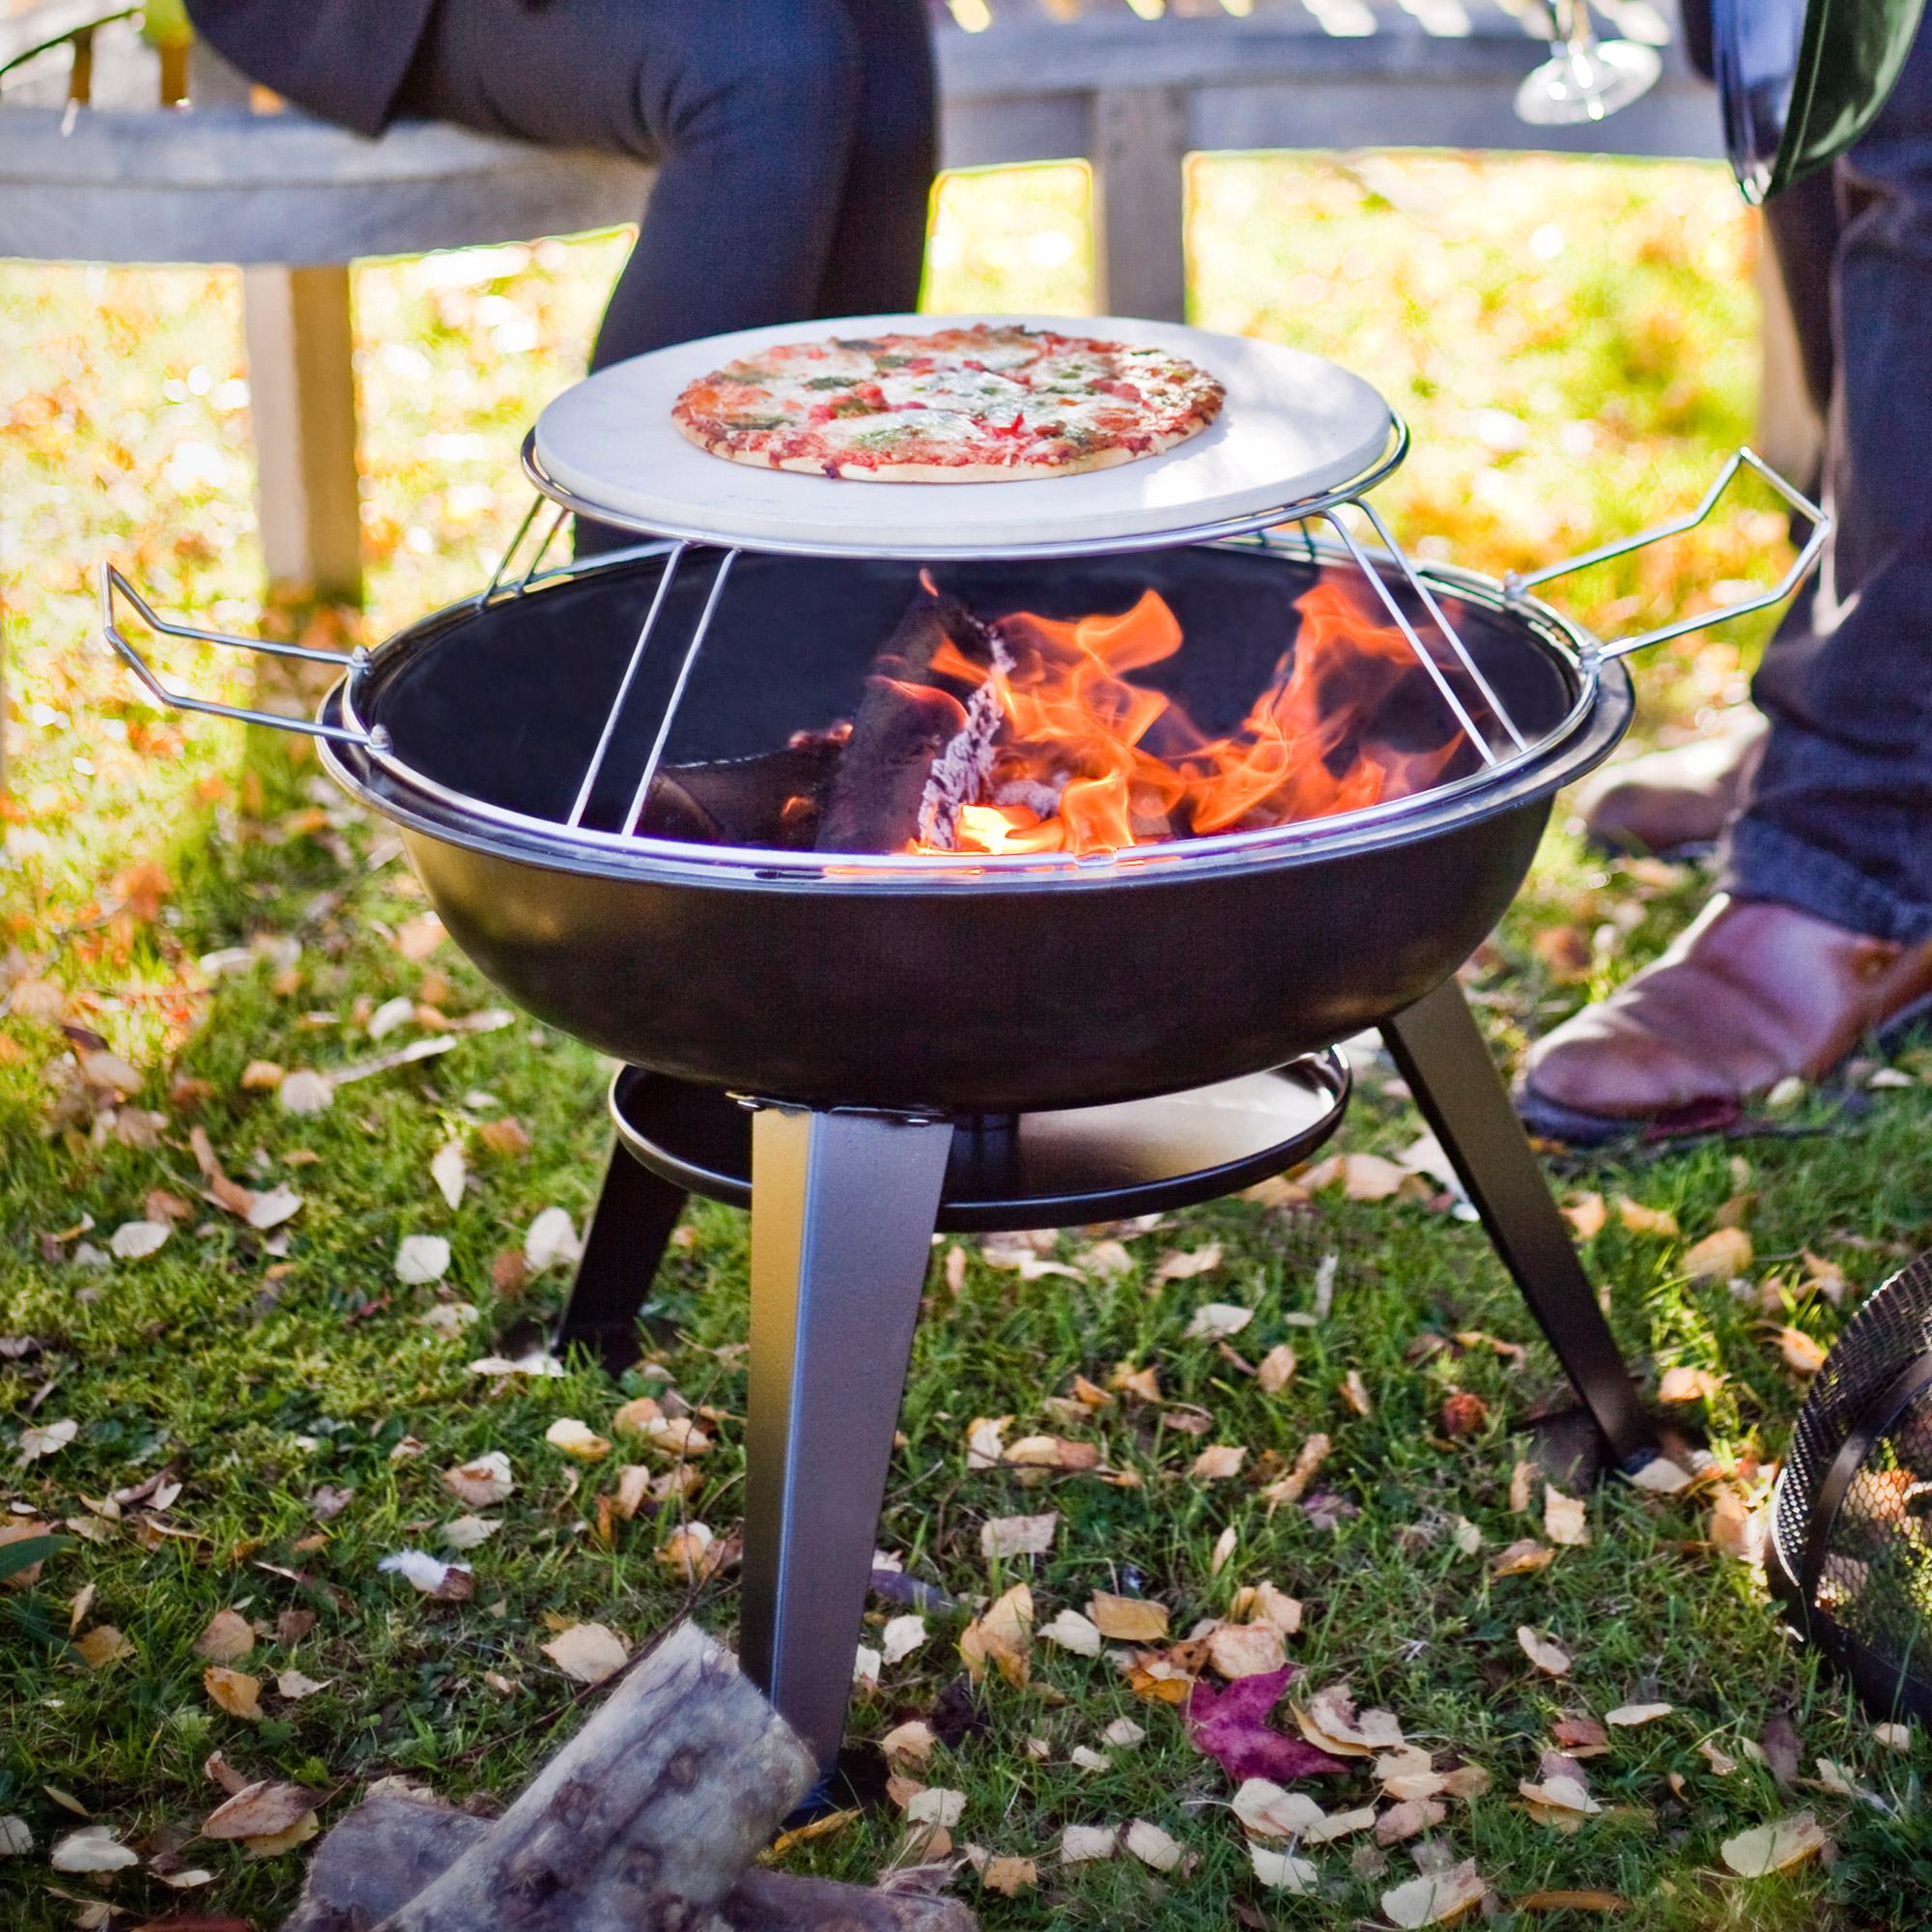 Barbecue portable et design nouveaux barbecues 2016 for Photo de barbecue exterieur